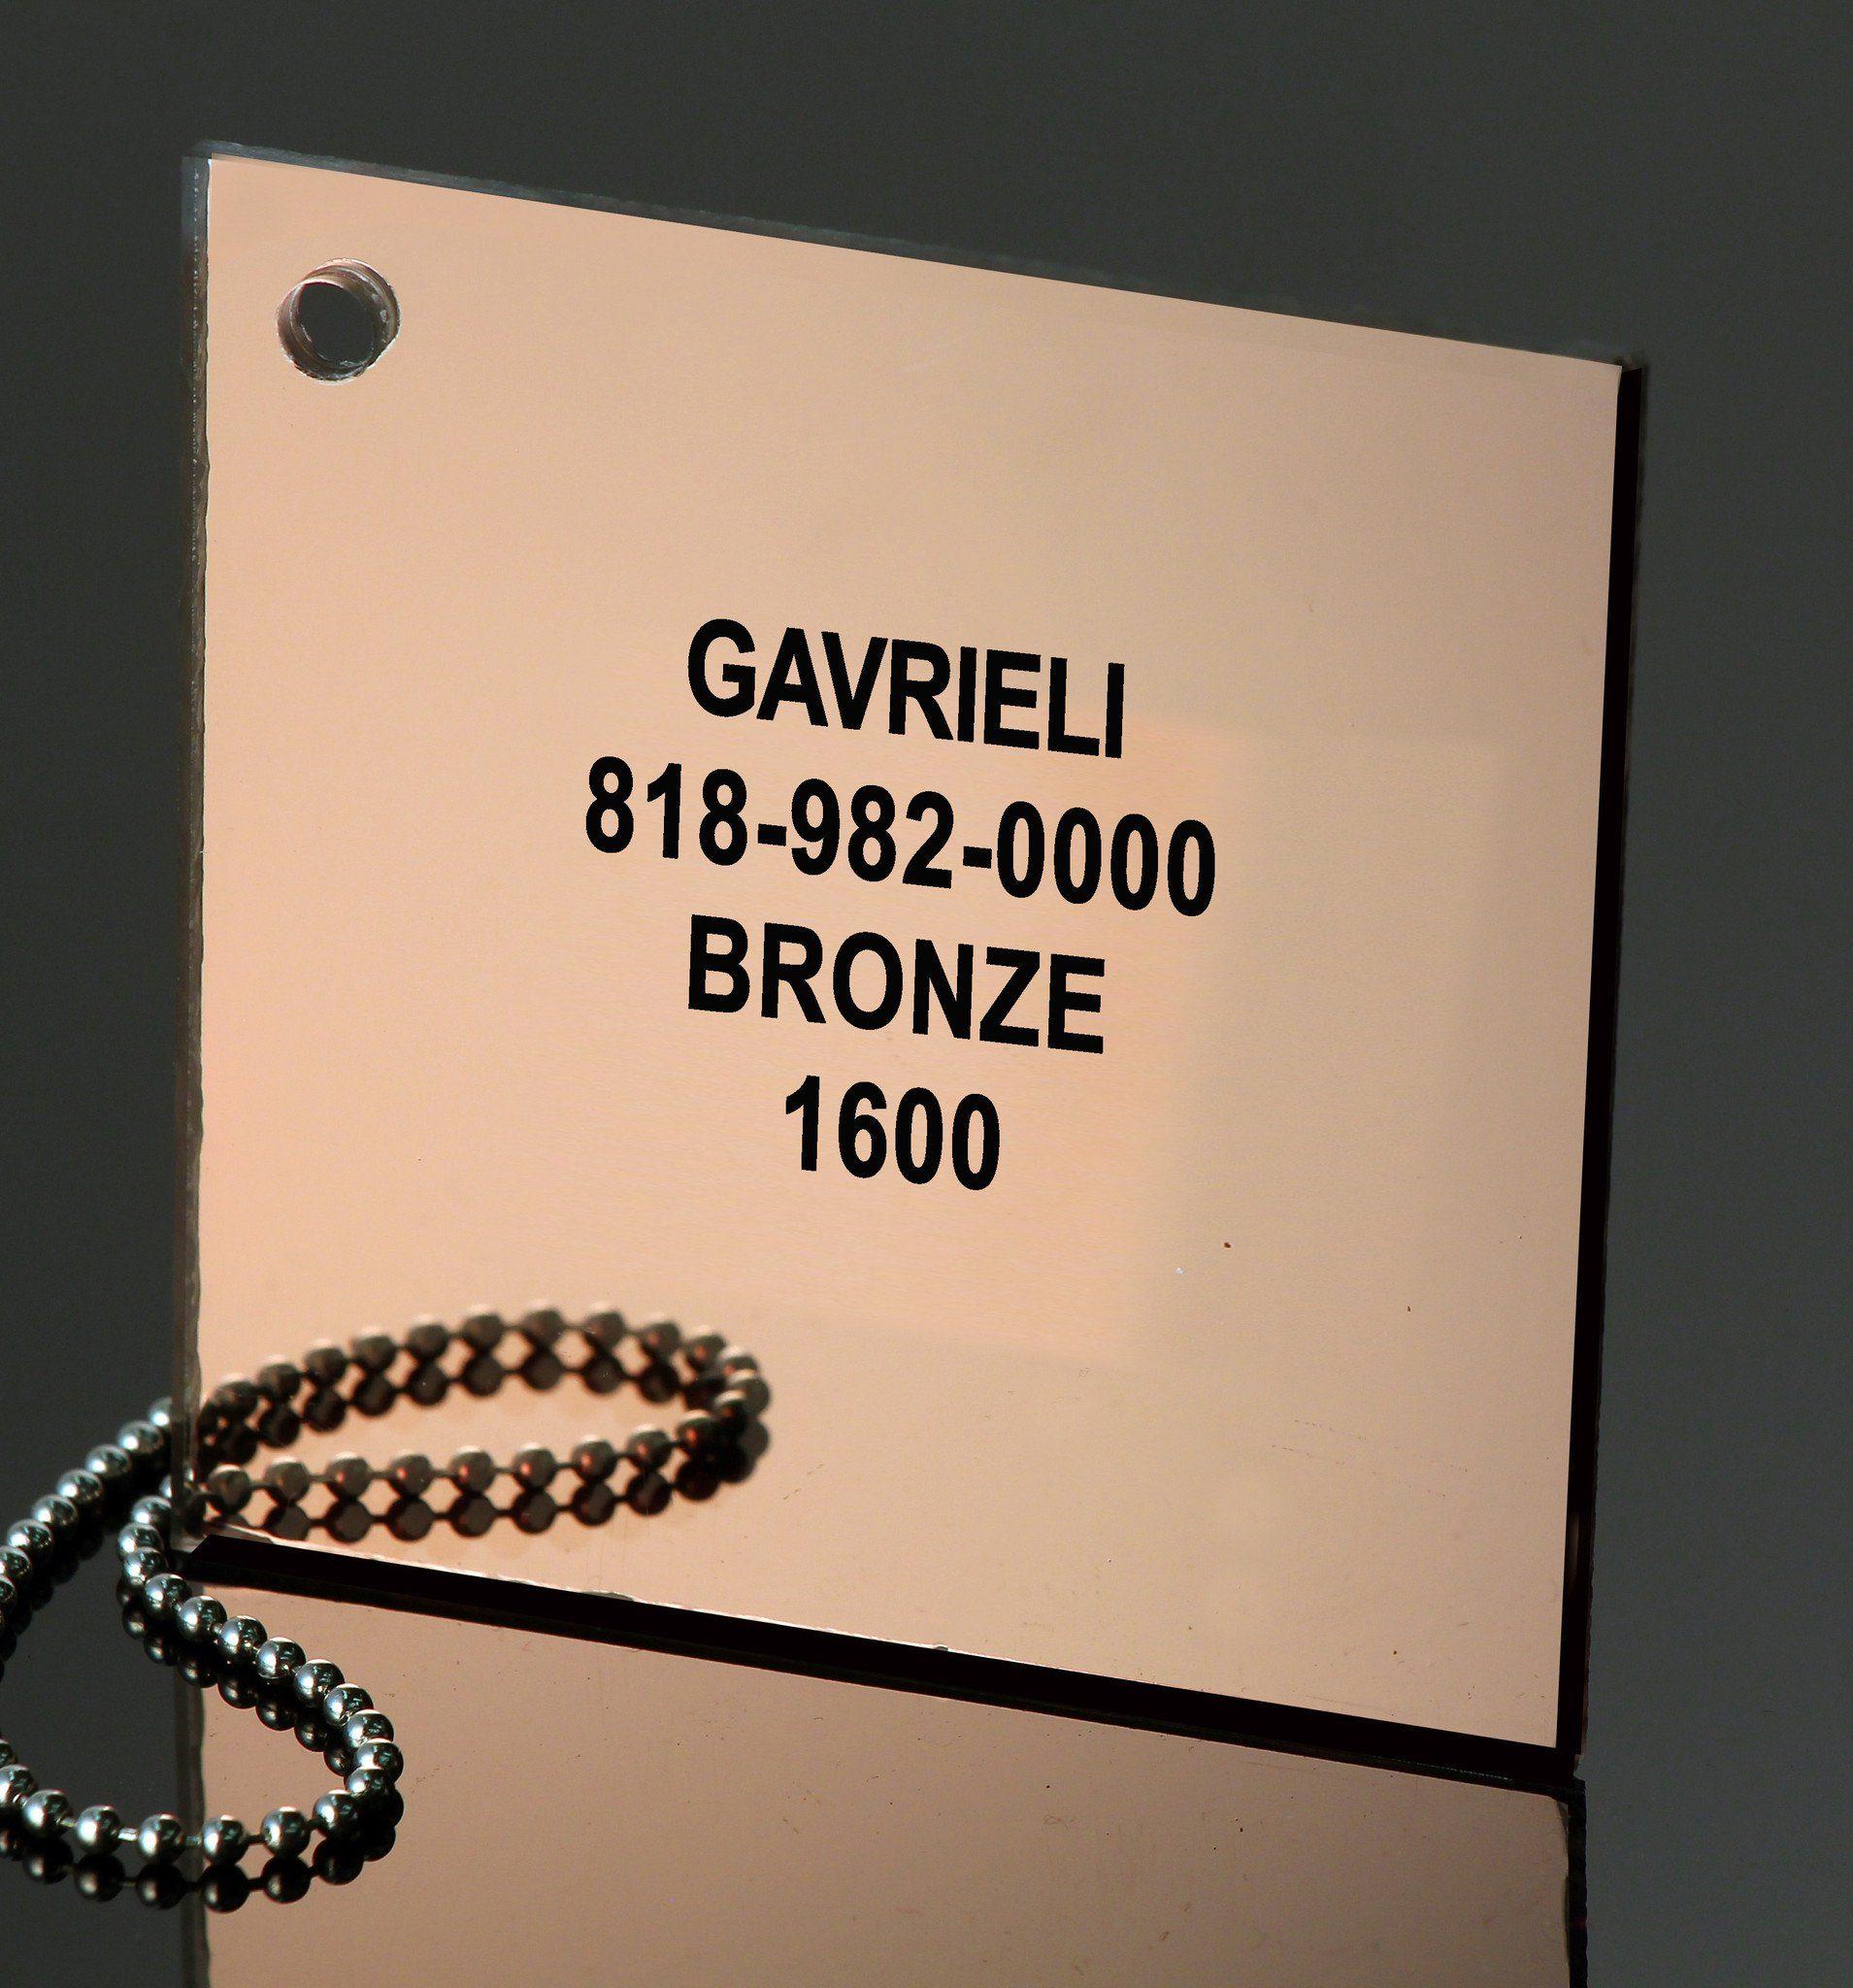 BRONZE 1600